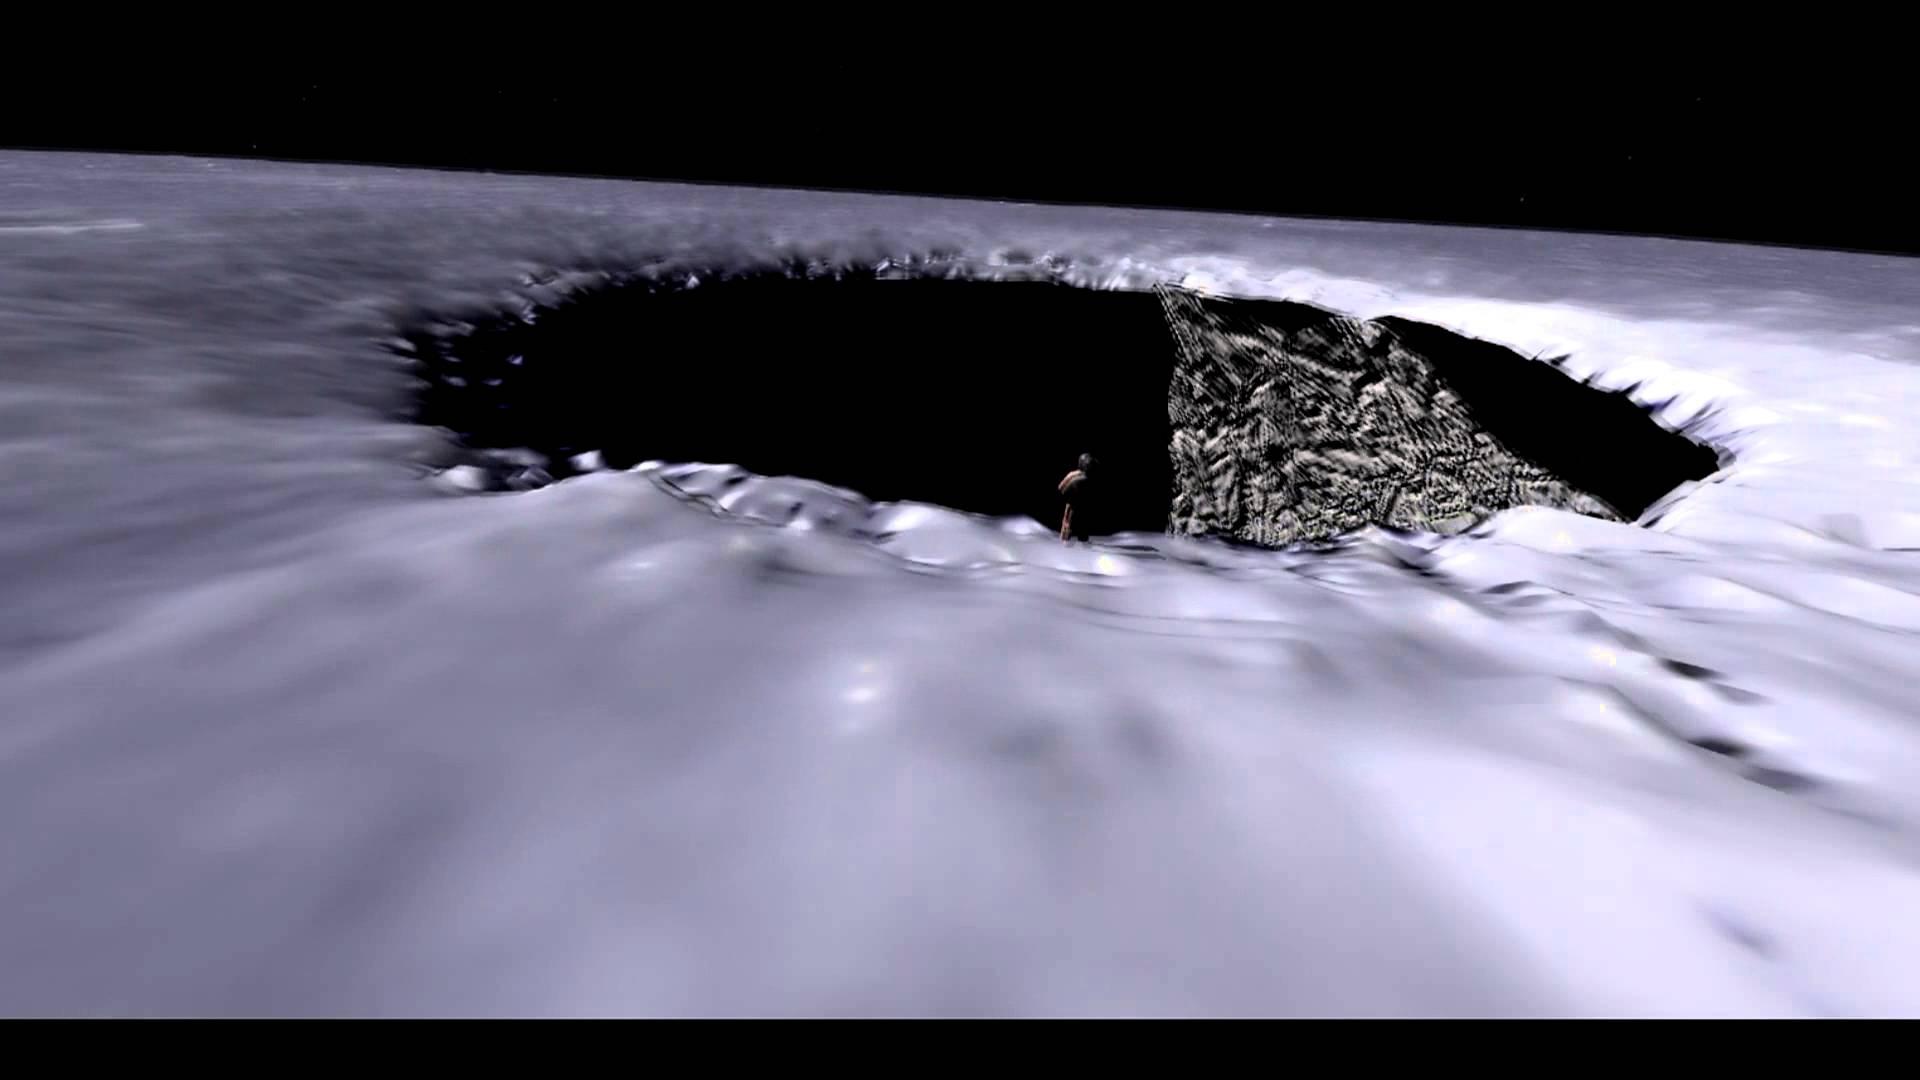 Lunar Pit.